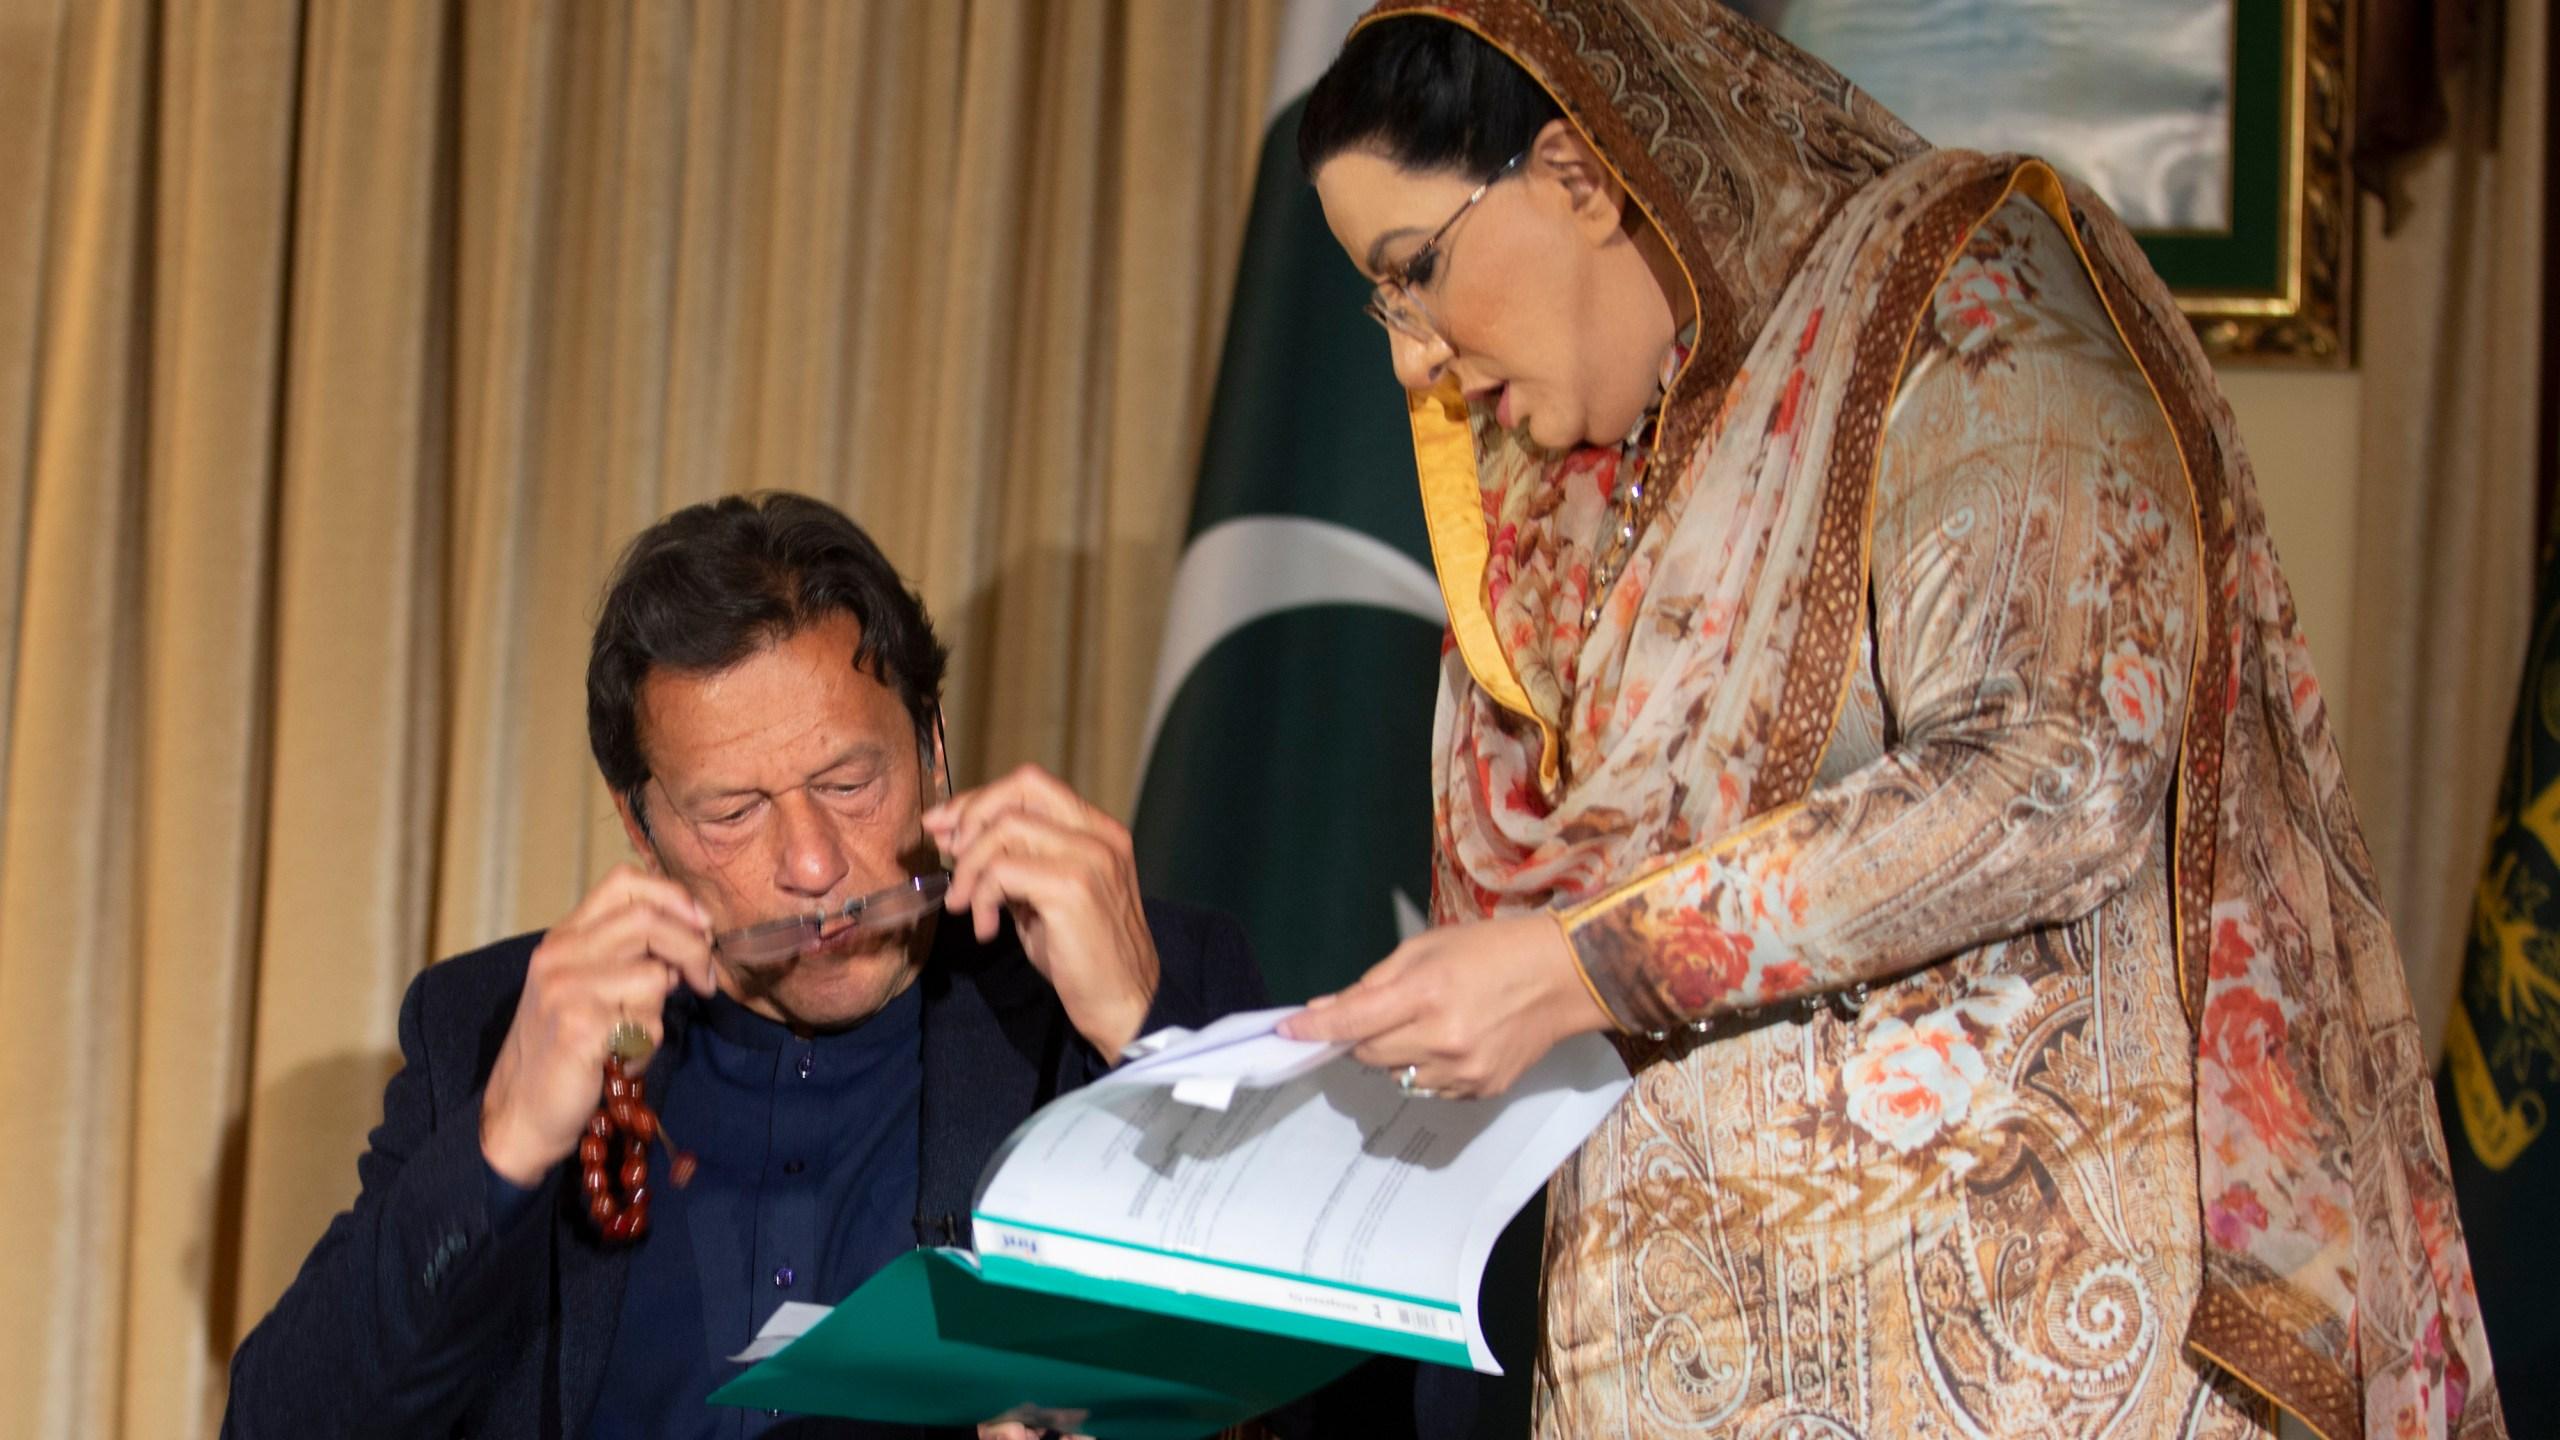 Pakistan PM warns new virus may devastate developing nations – MyStateline.com